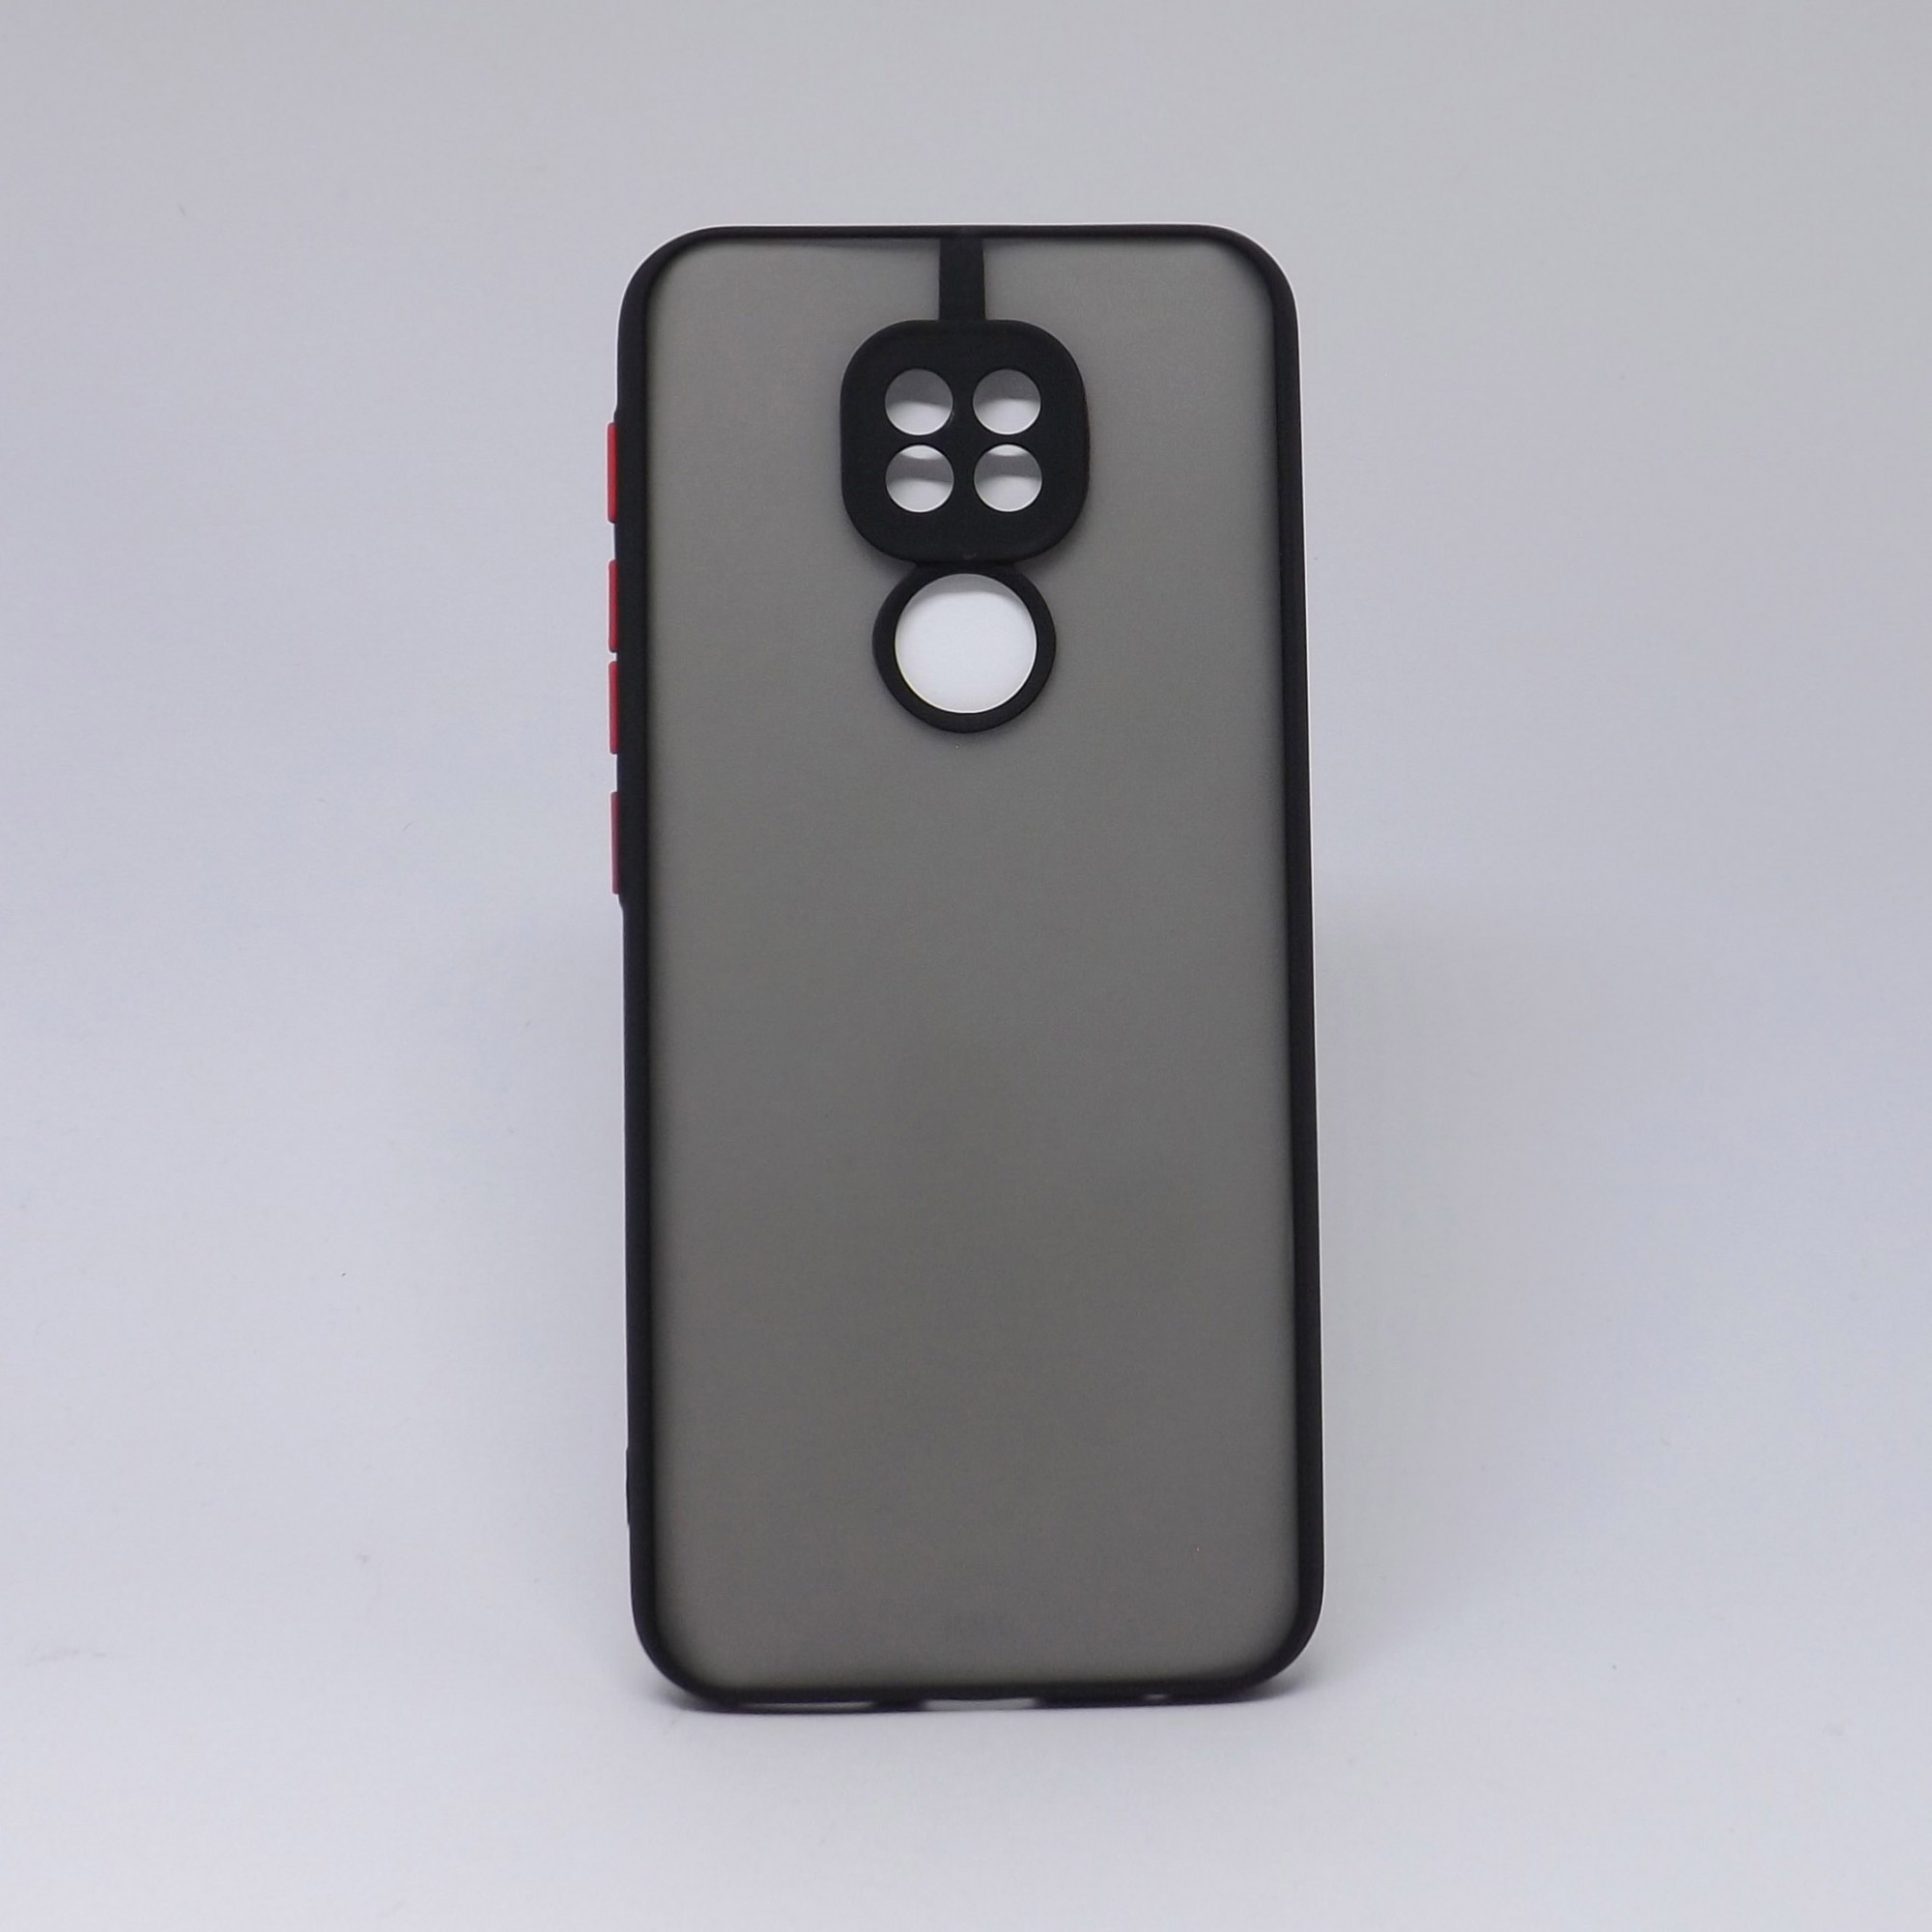 Capa Motorola G9 Play Fumê com Borda Colorida